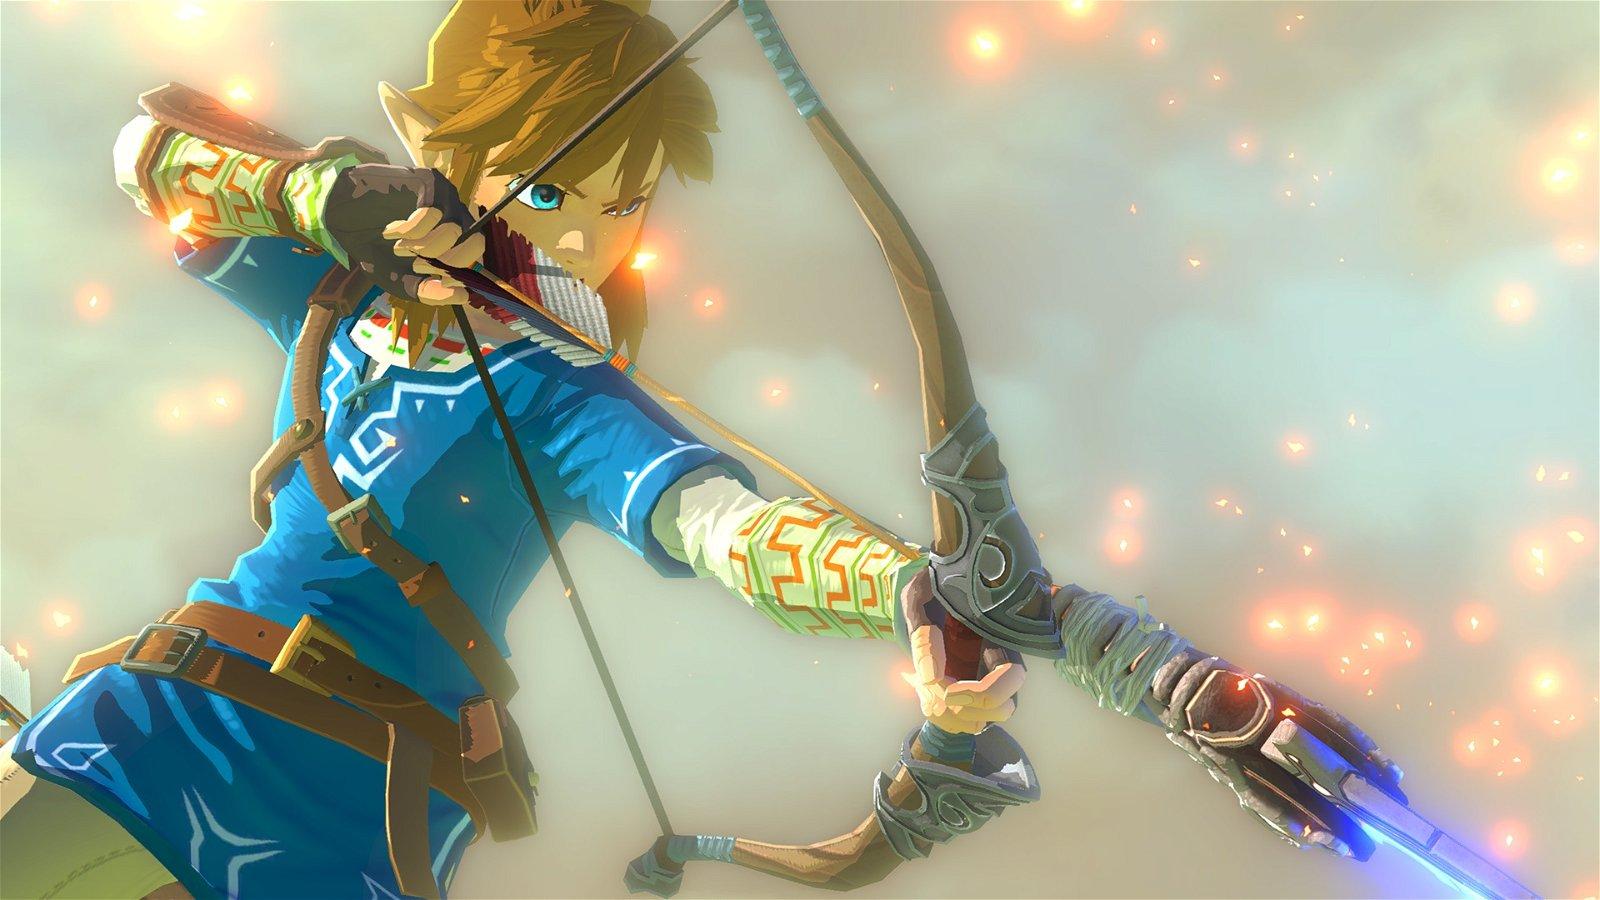 New Legend Of Zelda Will Be Nintendo's Focus At E3